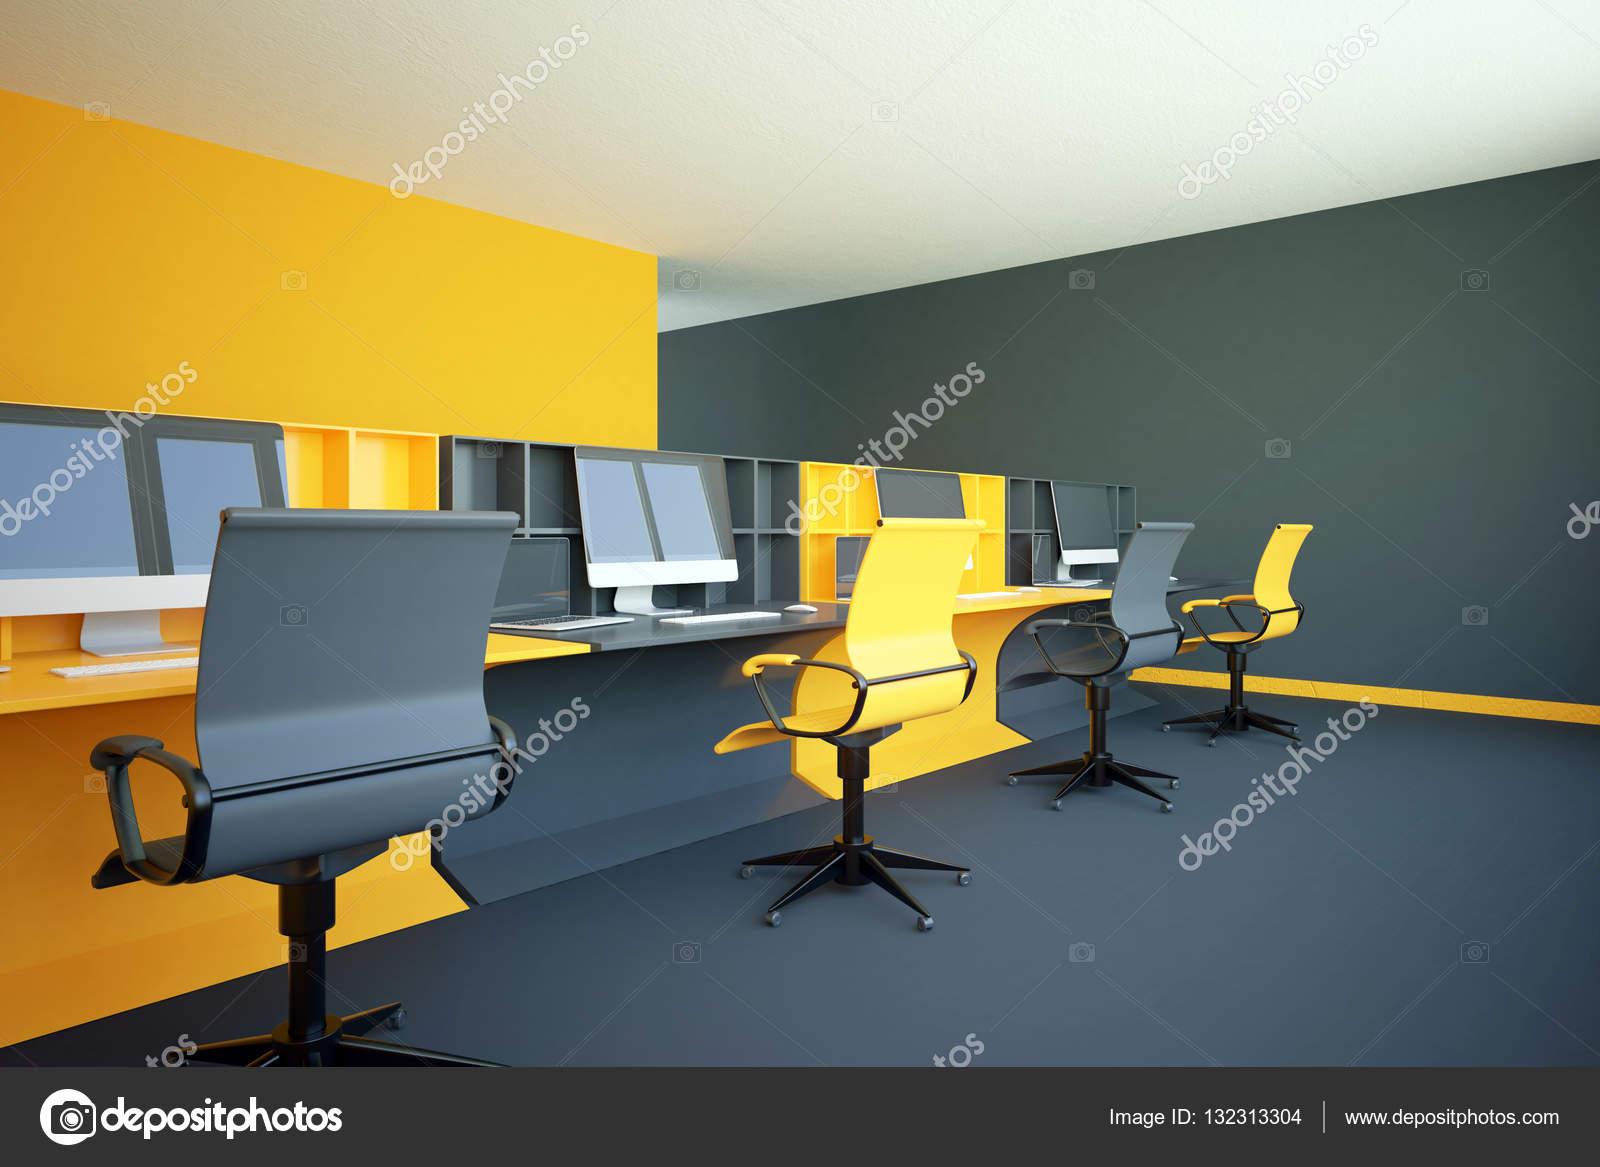 Bureau de coworking jaune u2014 photographie peshkova © #132313304